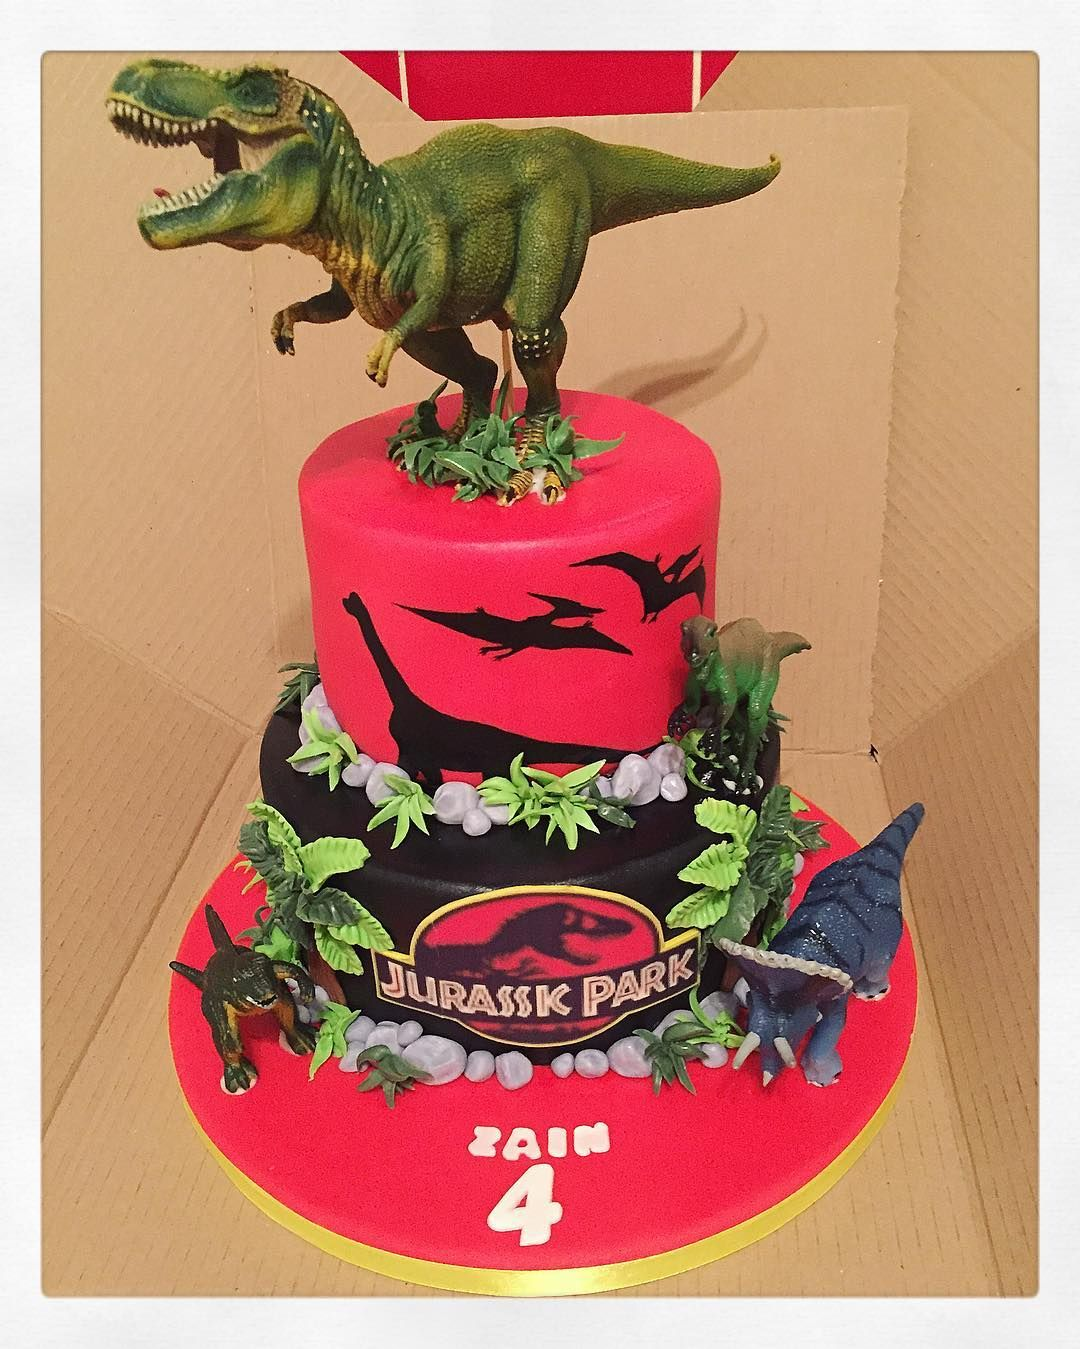 Jurassic Park Dinosaur Cake Amazingly Geeky Cakes Dinosaur